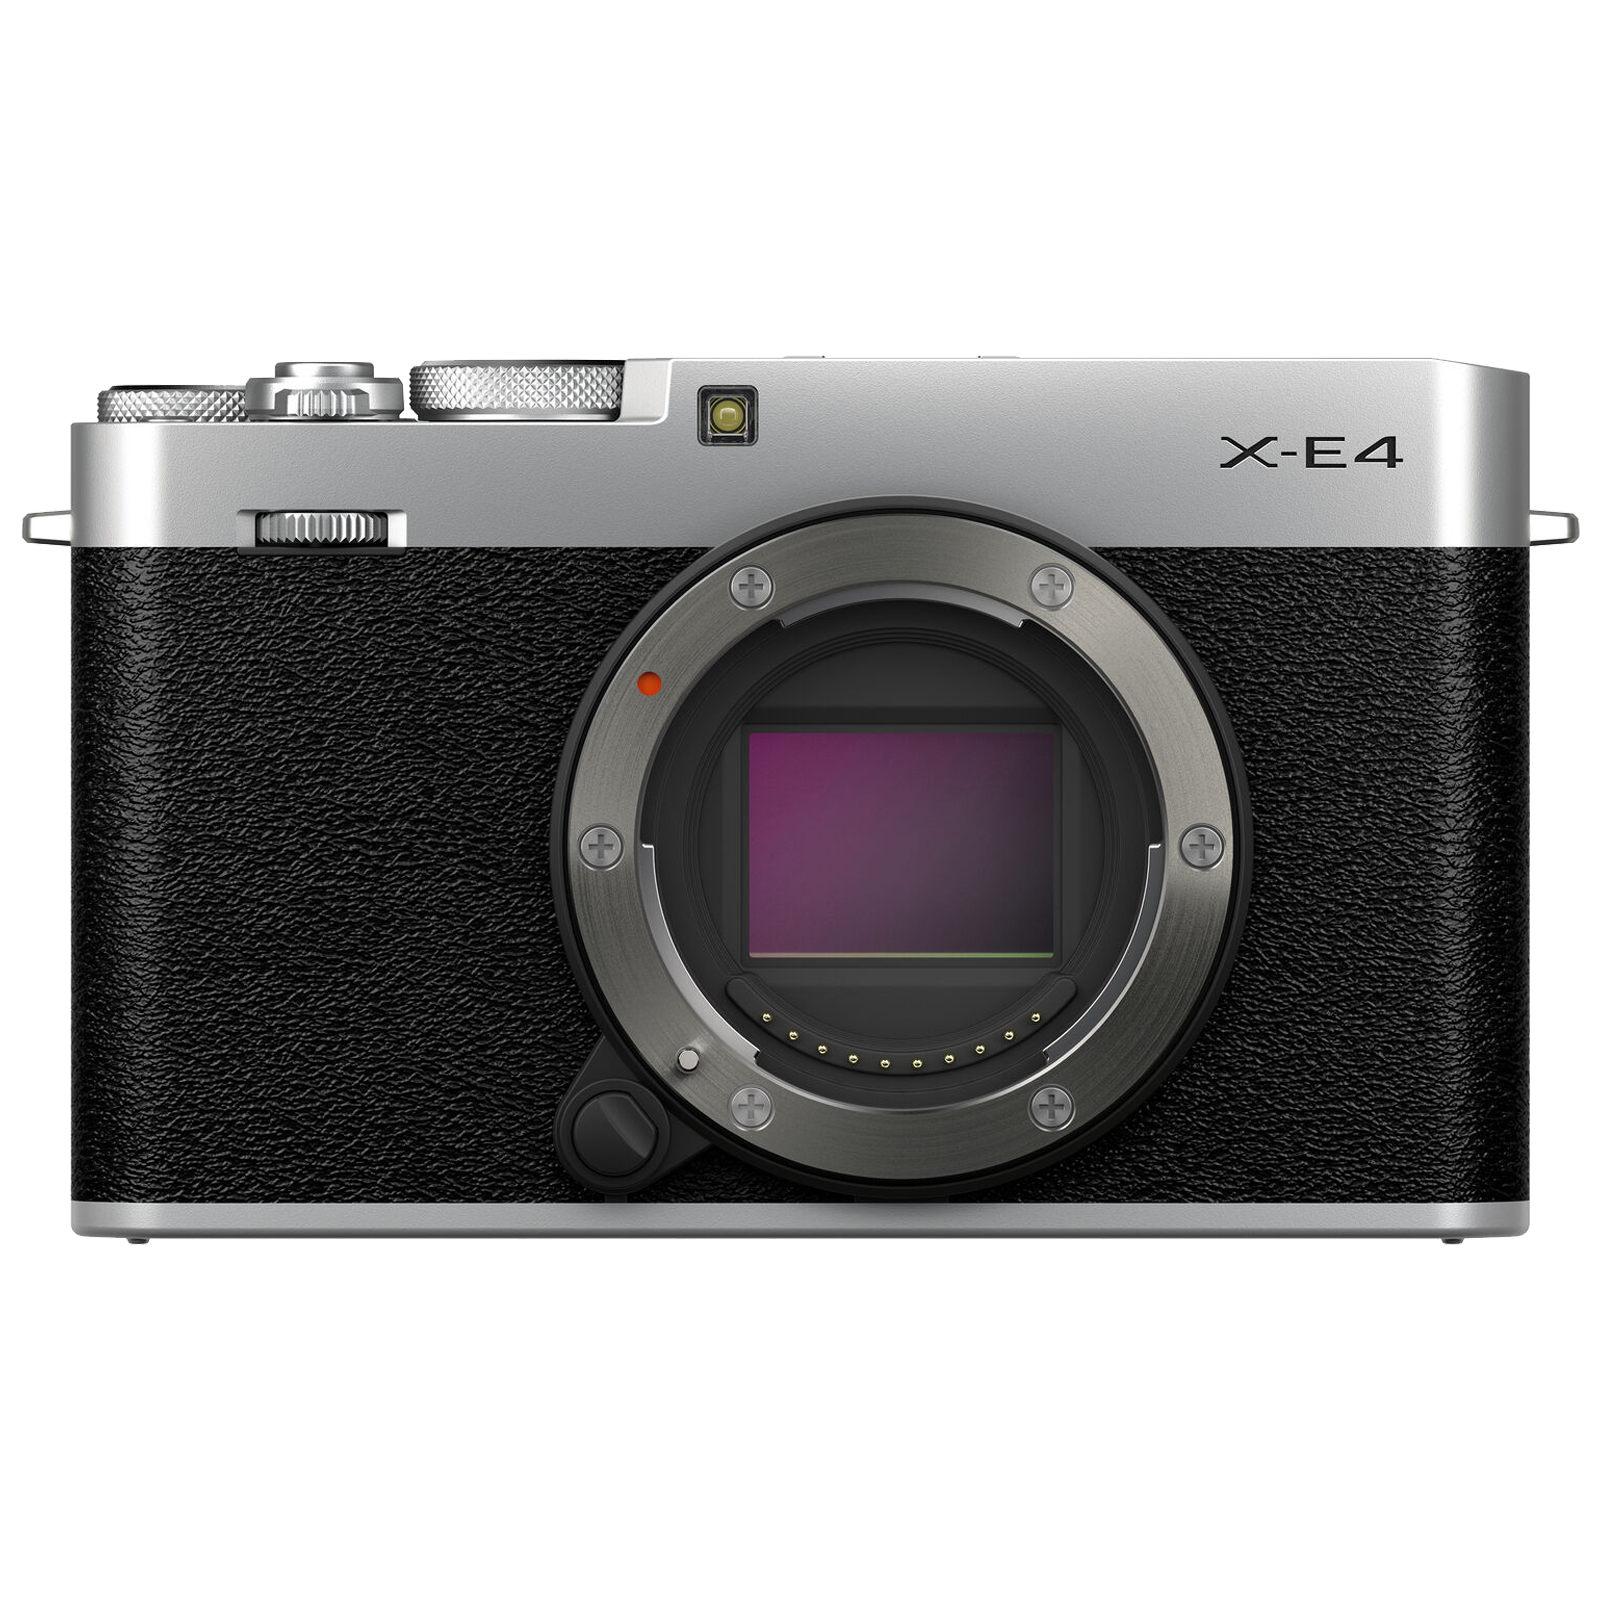 Fujifilm X-E4 26.1MP Mirrorless Camera (Intelligent Hybrid Phase Detection Autofocus, Silver)_1